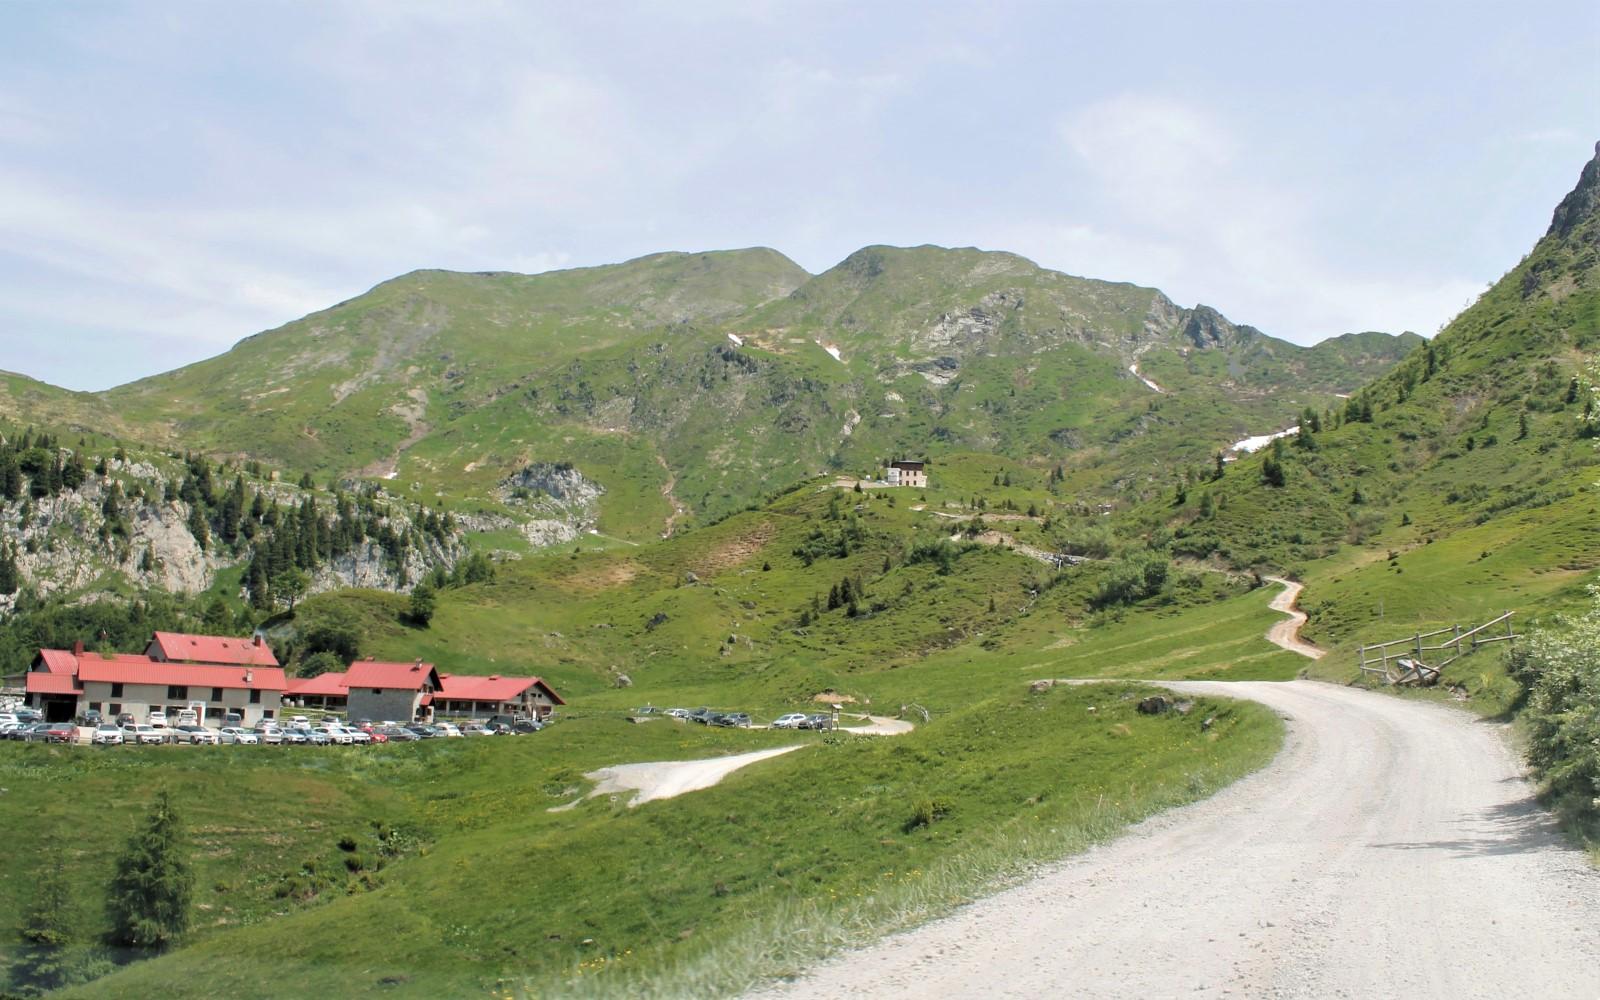 De weg naar Malga Pramosio